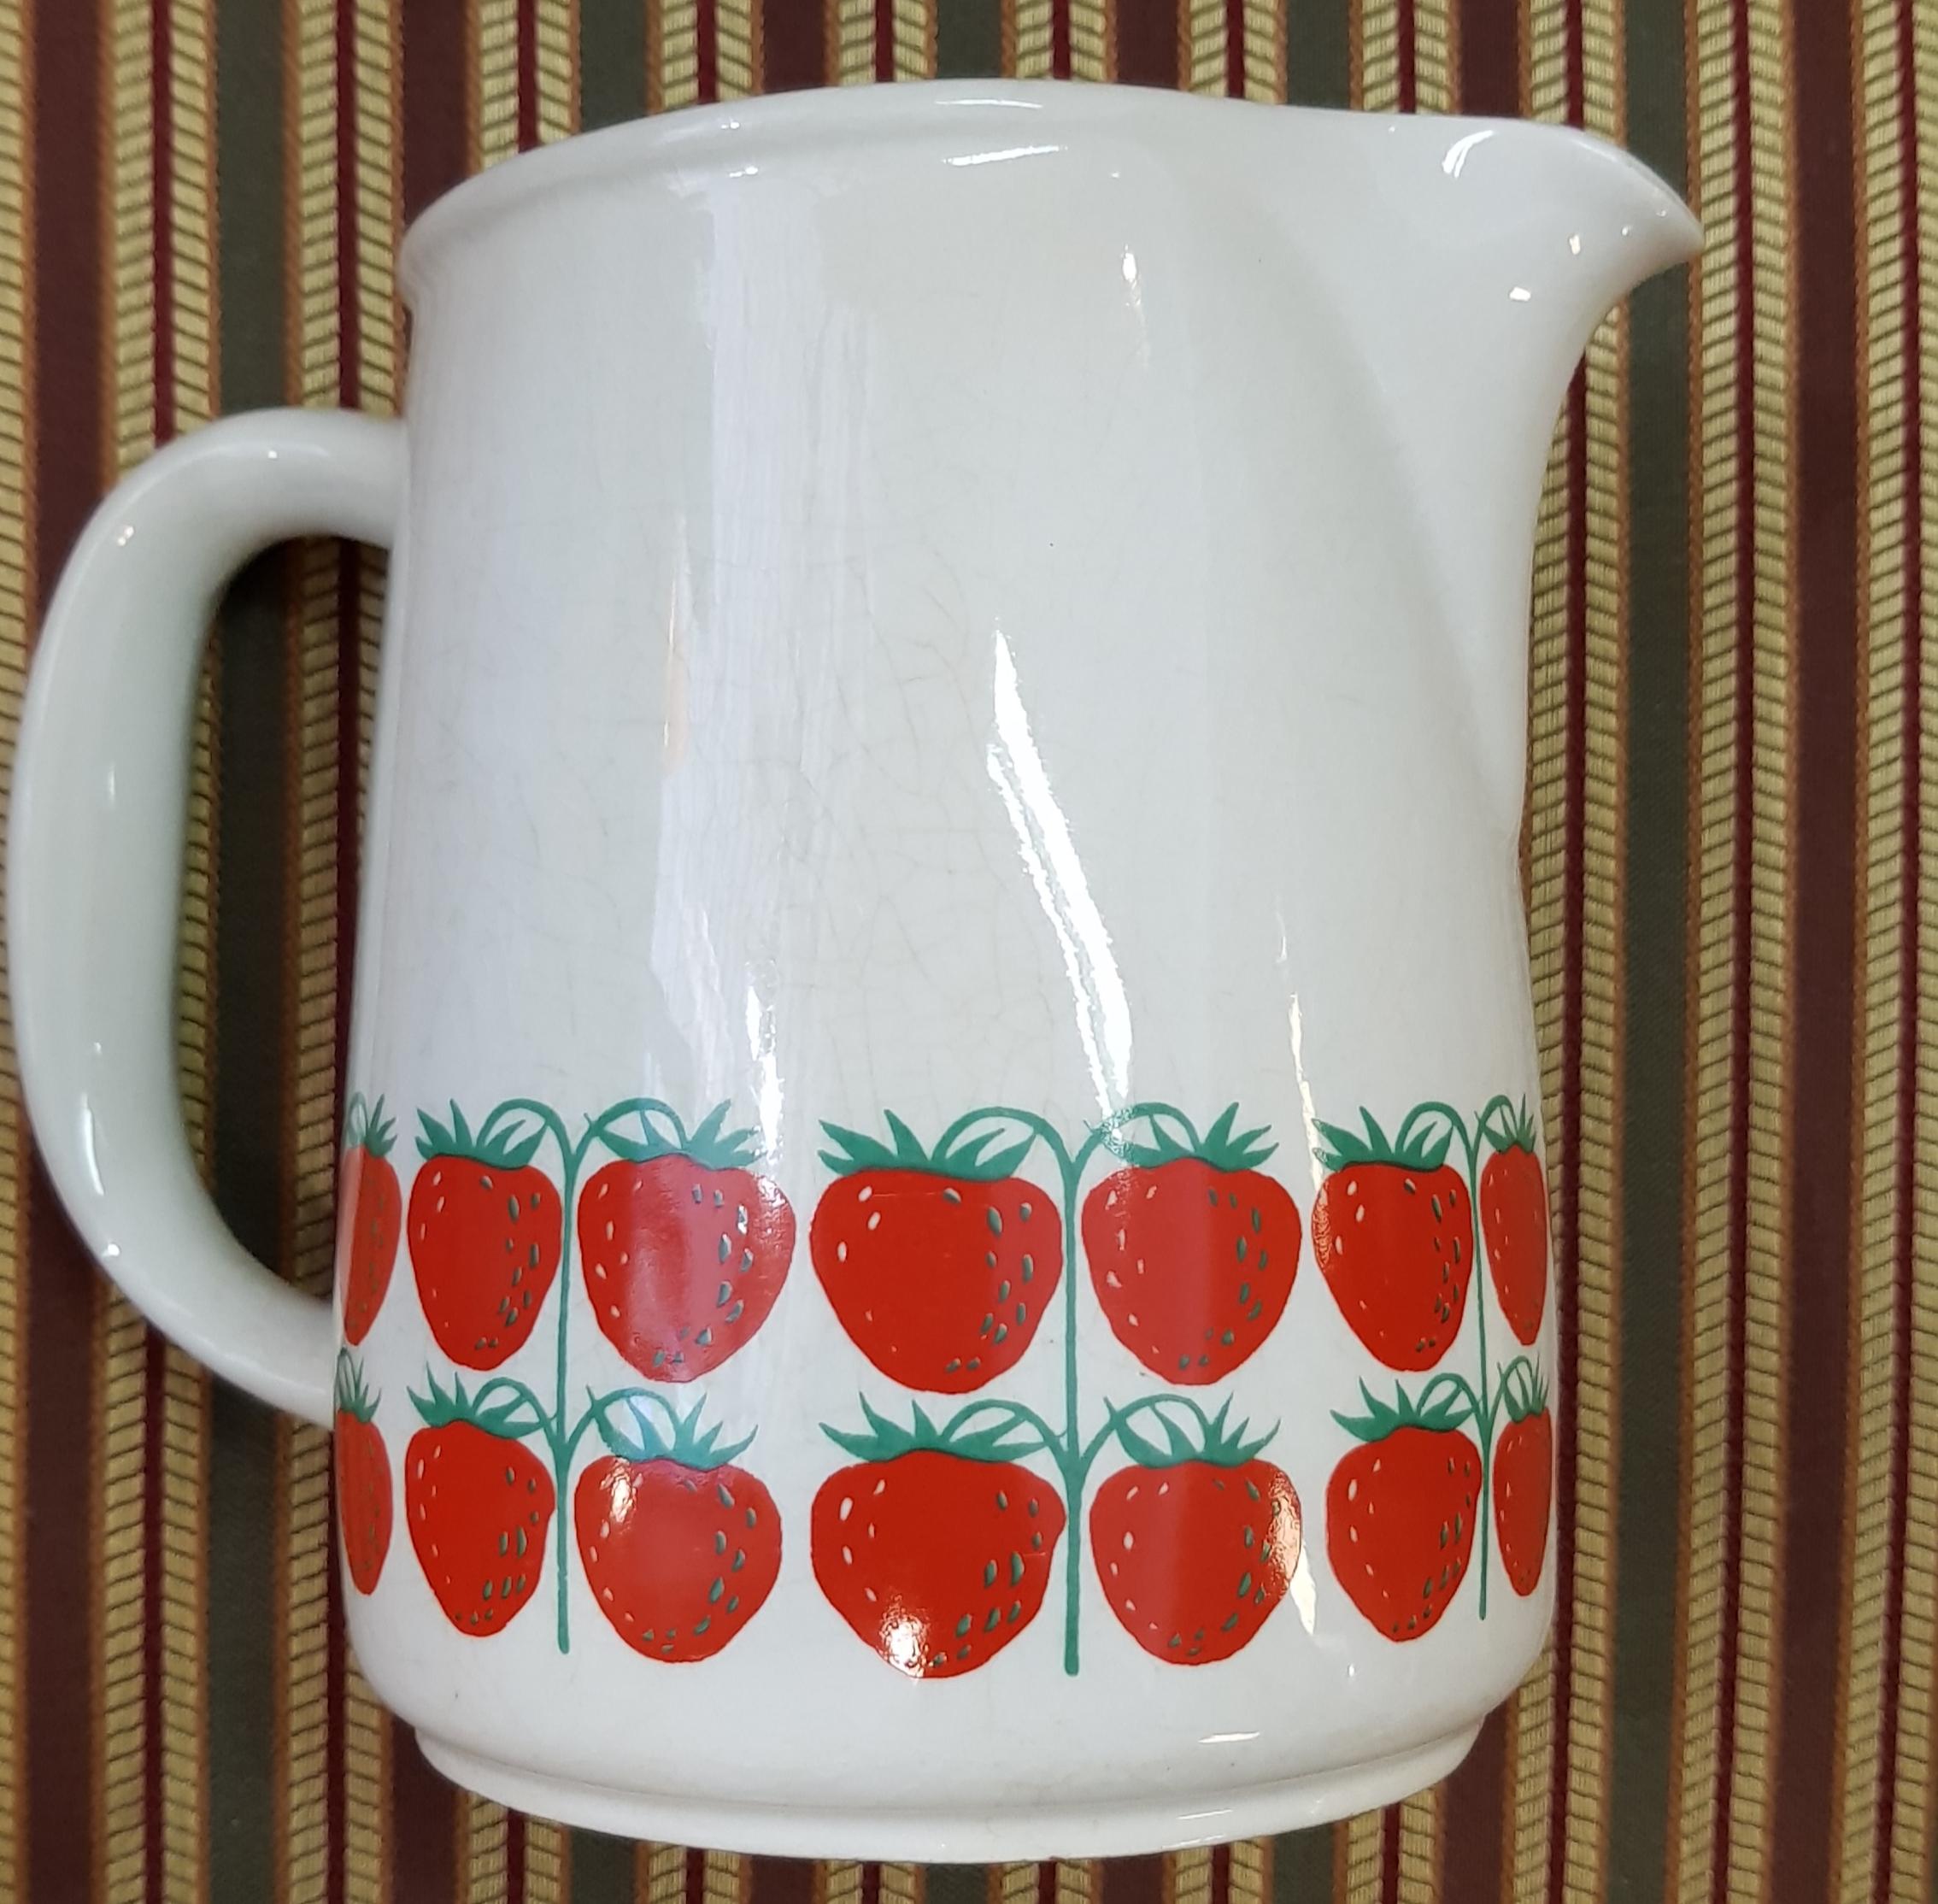 Pomona mansikkakannu, arabia